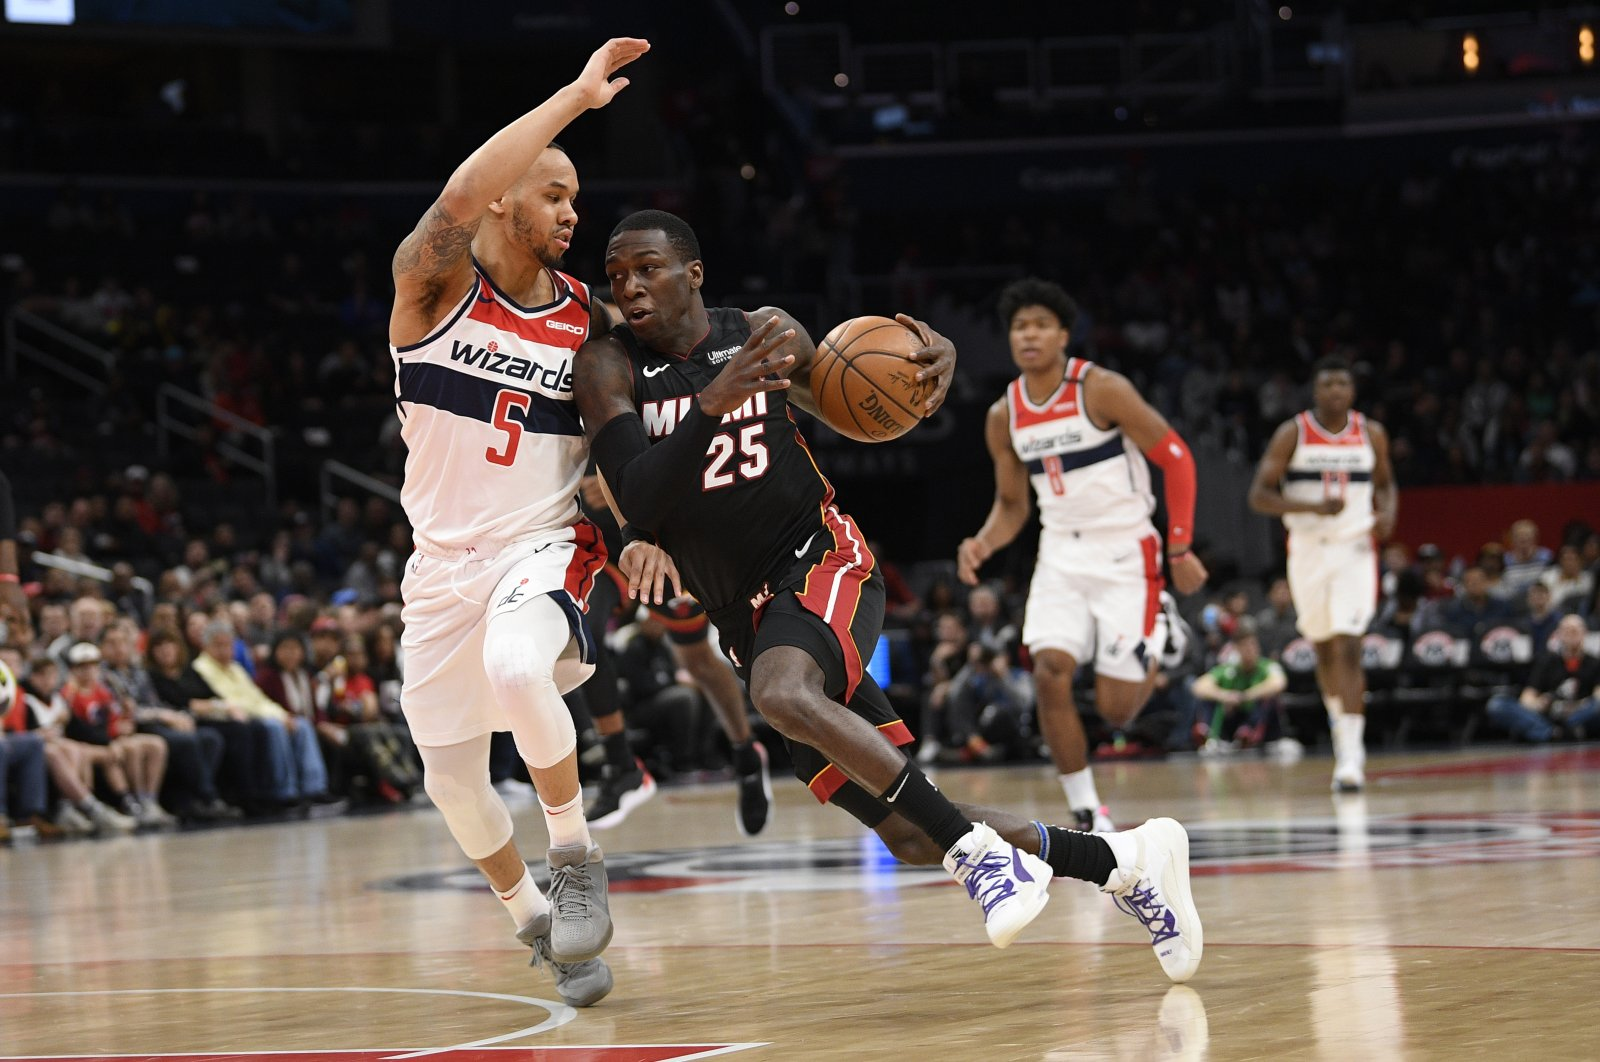 Miami Heat guard Kendrick Nunn (25) drives to the basket against Washington Wizards guard Shabazz Napier (5) during an NBA game, in Washington, D.C., U.S., March 8, 2020. (AP Photo)